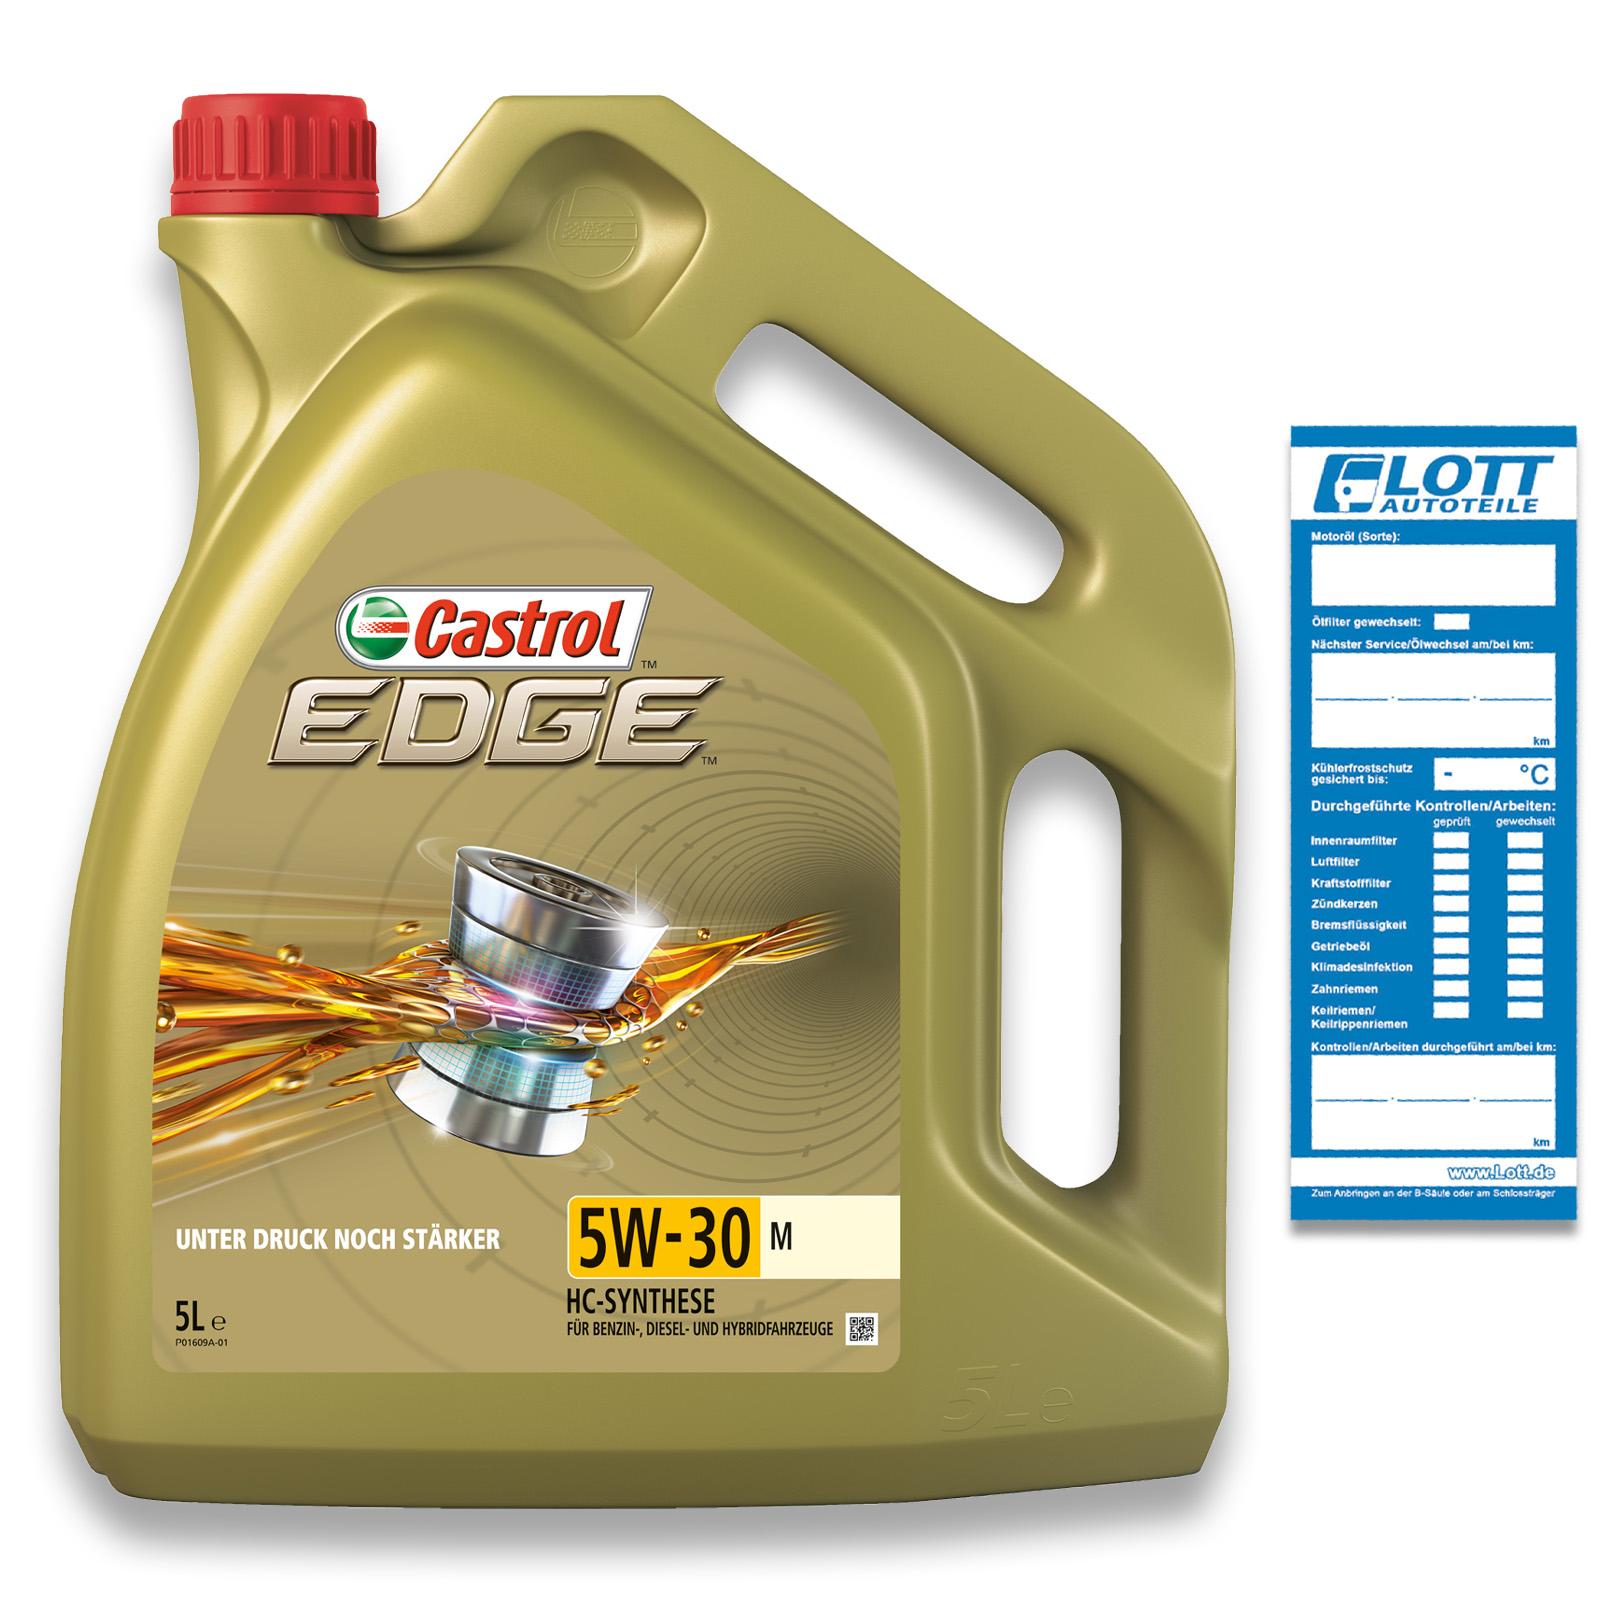 CASTROL Motoröl EDGE 5W-30 M